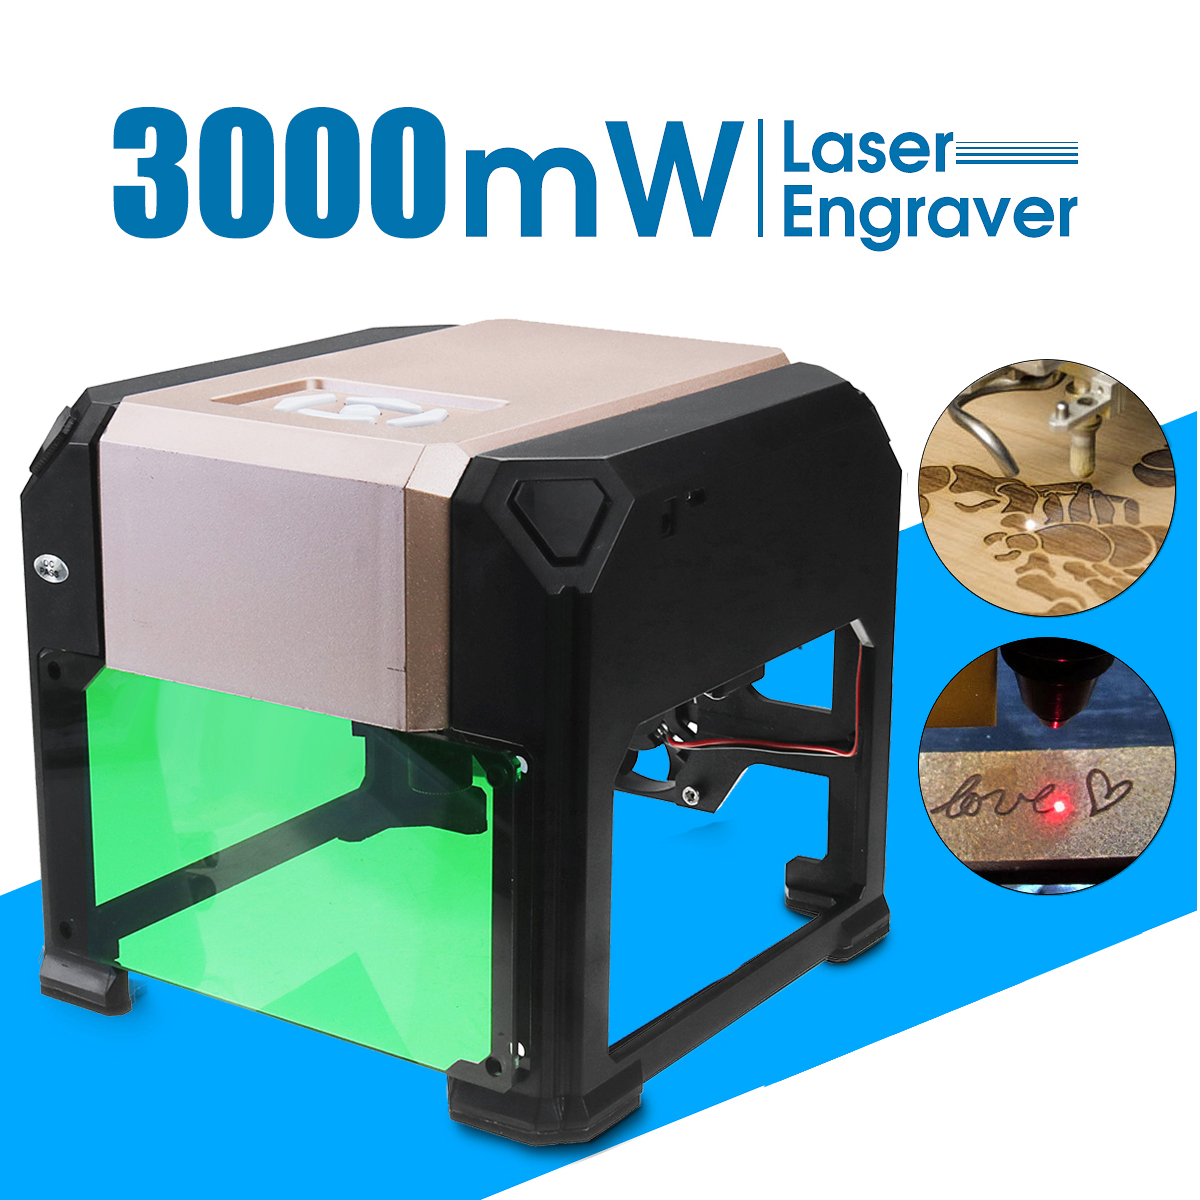 3000 mW USB Gravador Do Laser Cortador De Impressora Carver DIY Logotipo da Marca de Corte A Laser Máquina de Gravura do CNC Máquina de Escultura A Laser Casa uso